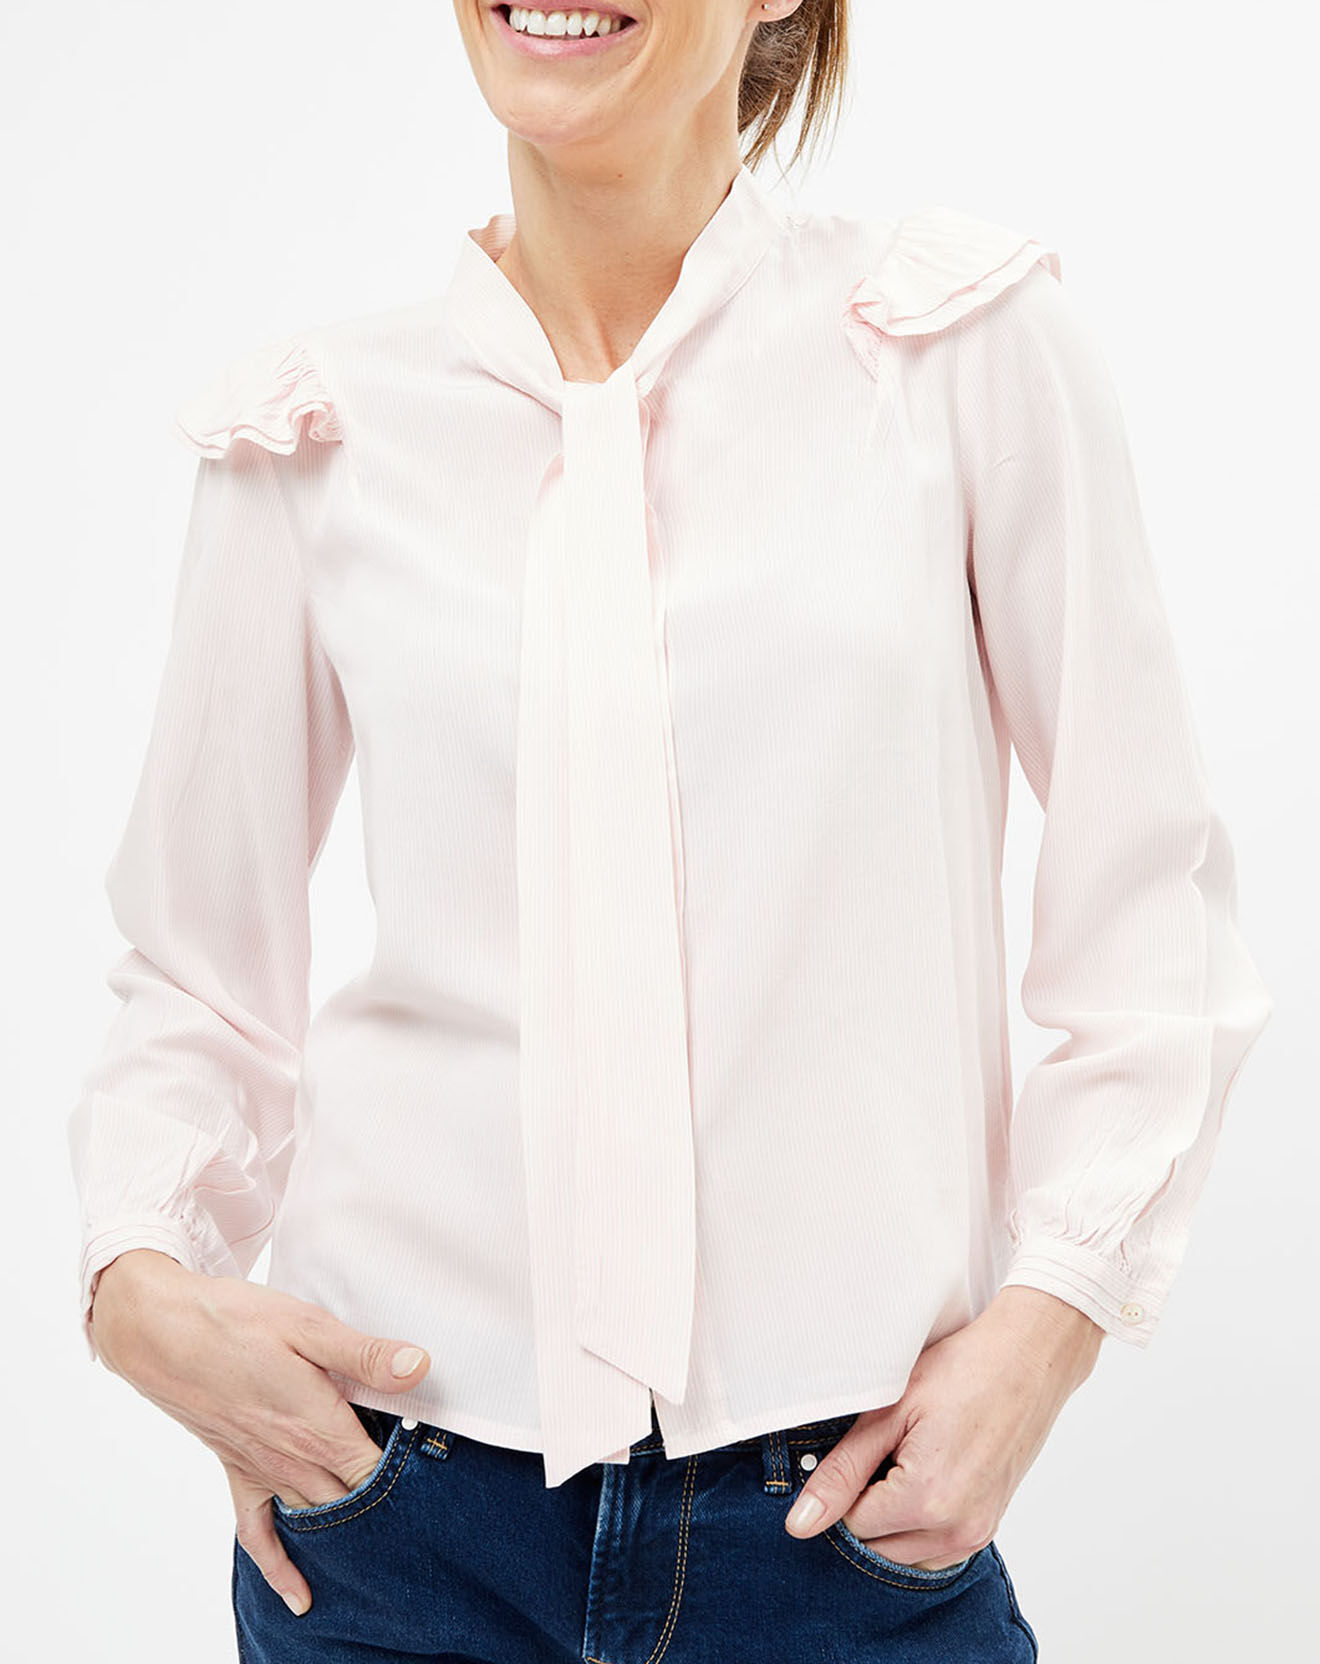 Chemise à volants rayée rose - Pepe Jeans - Modalova